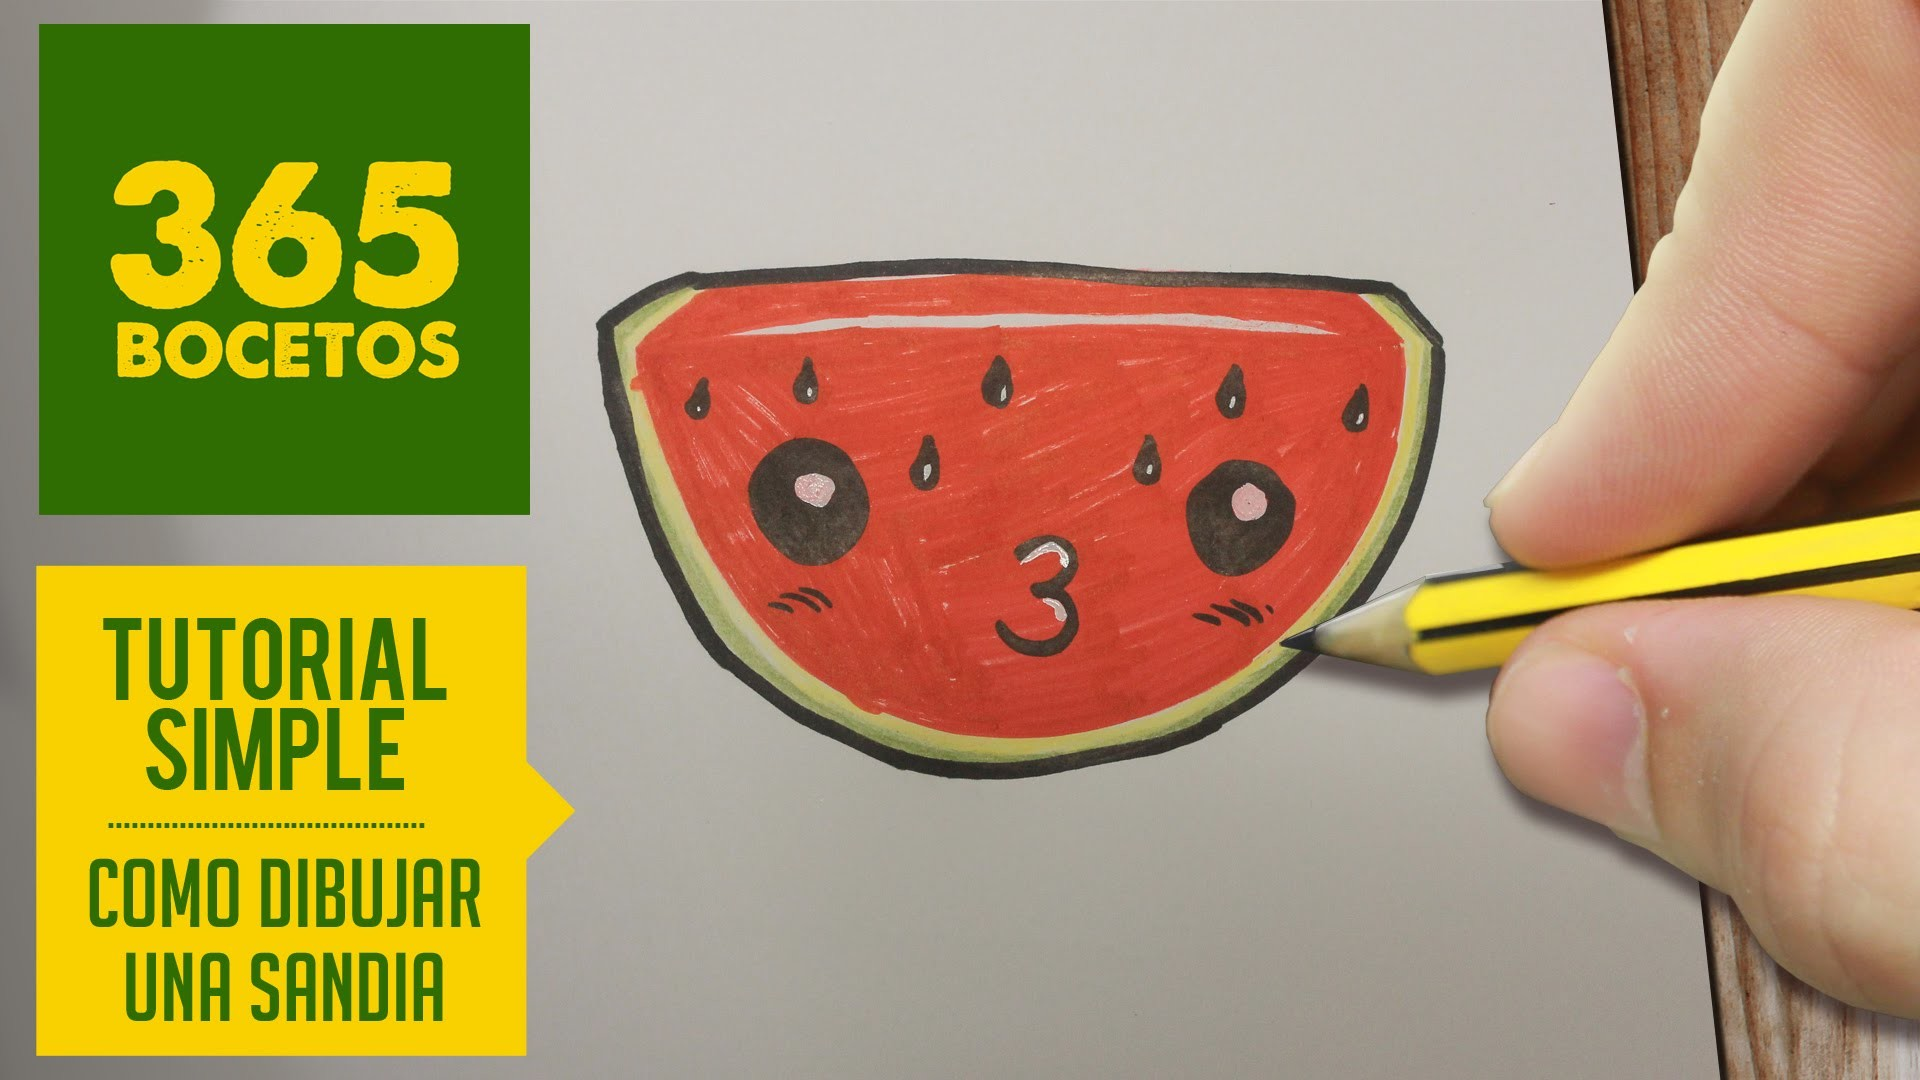 COMO DIBUJAR UNA SANDIA KAWAII PASO A PASO - Dibujos kawaii faciles - How to draw a watermelon